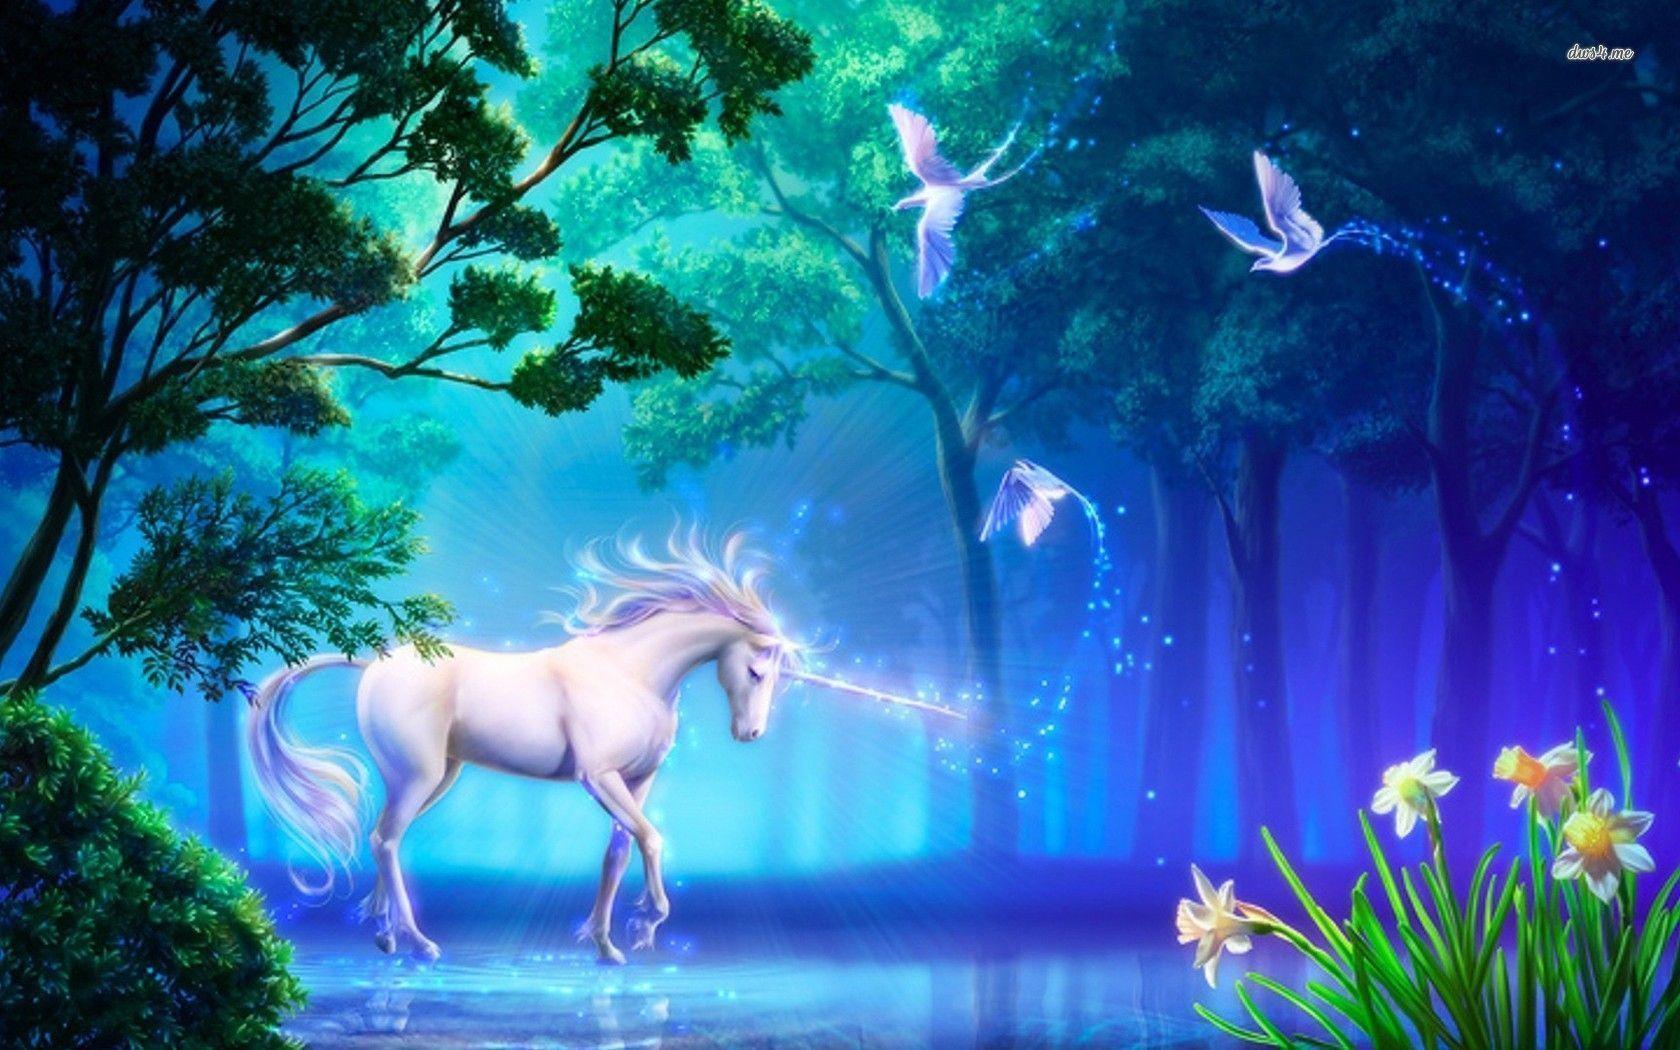 Unicorn Desktop Backgrounds - Wallpaper Cave Unicorn Background